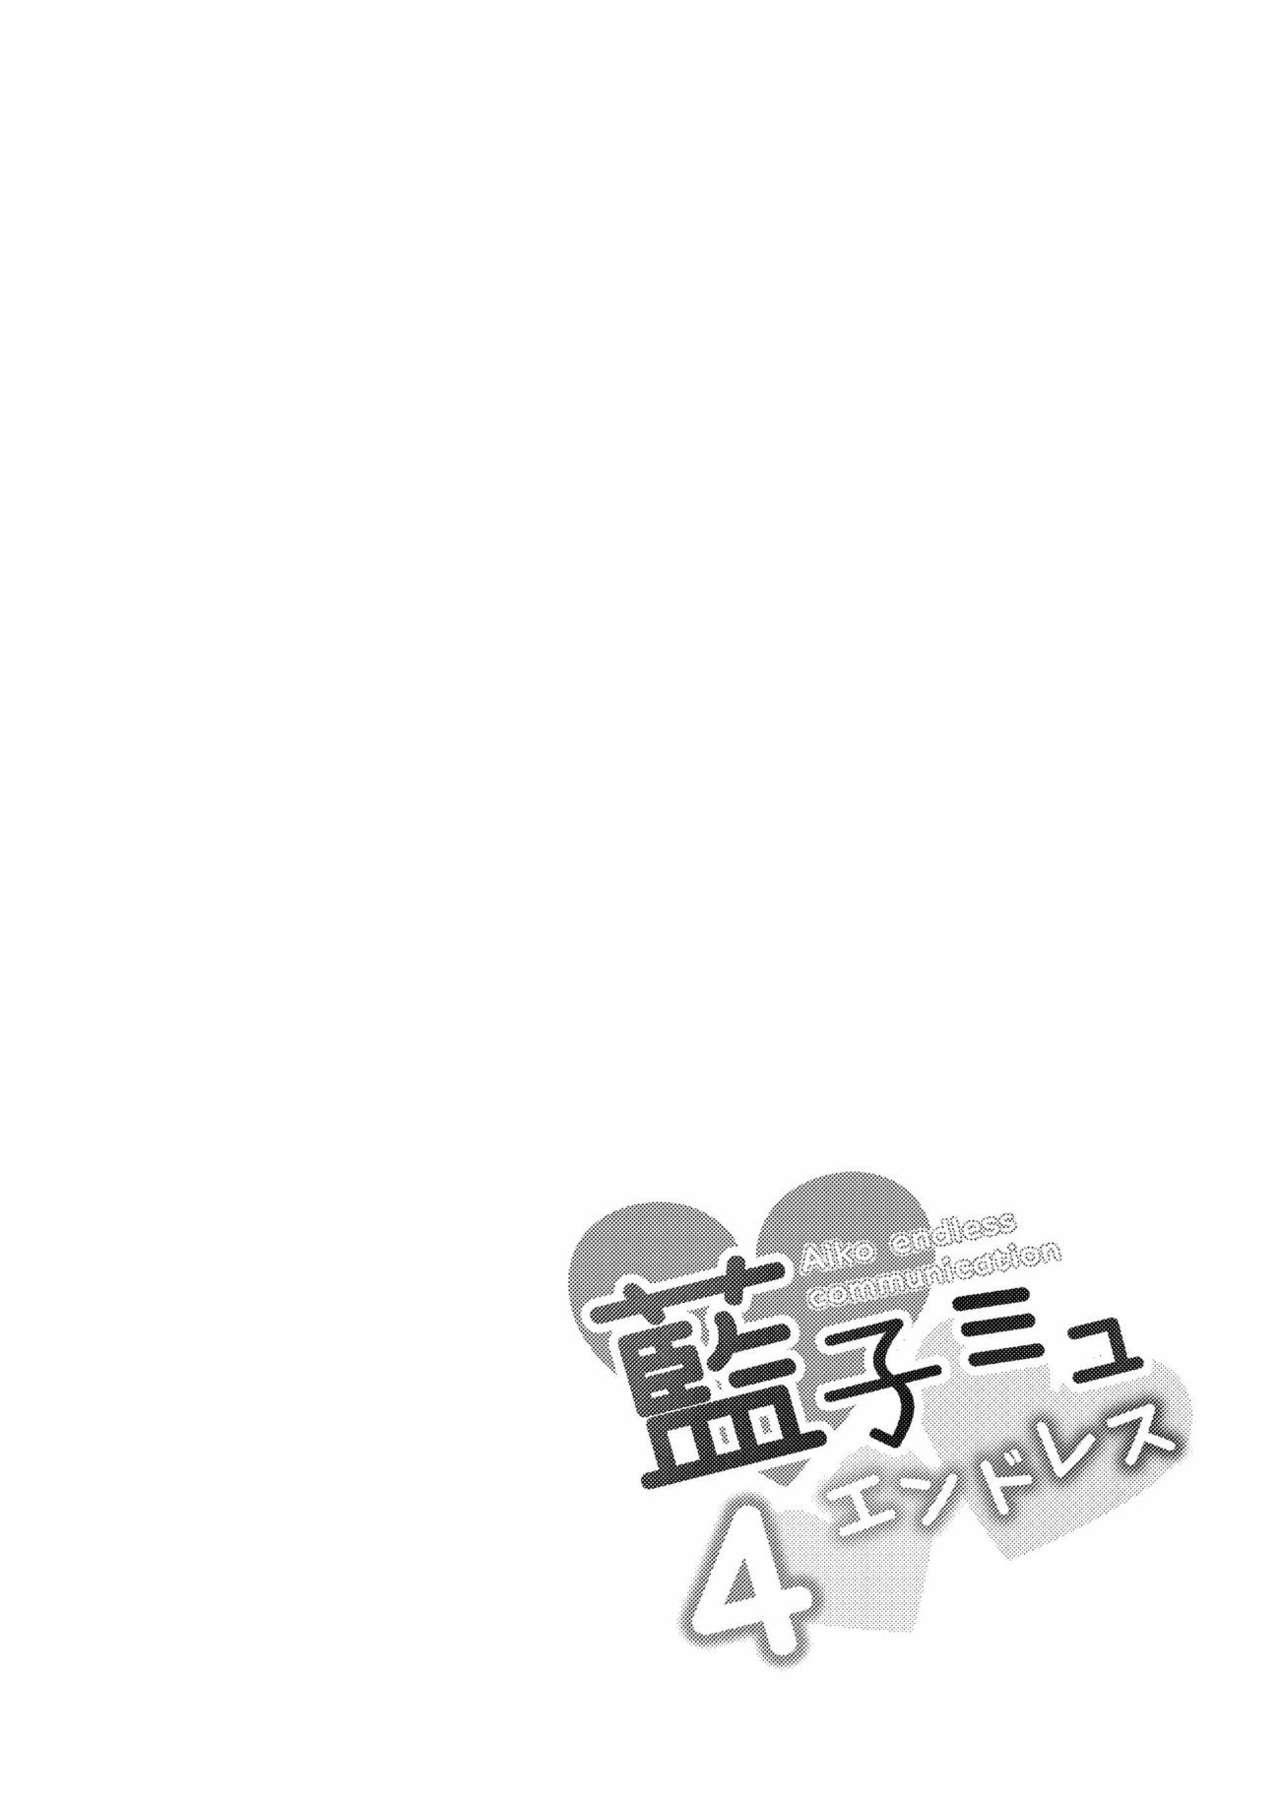 Aiko Myu Endless 4 2